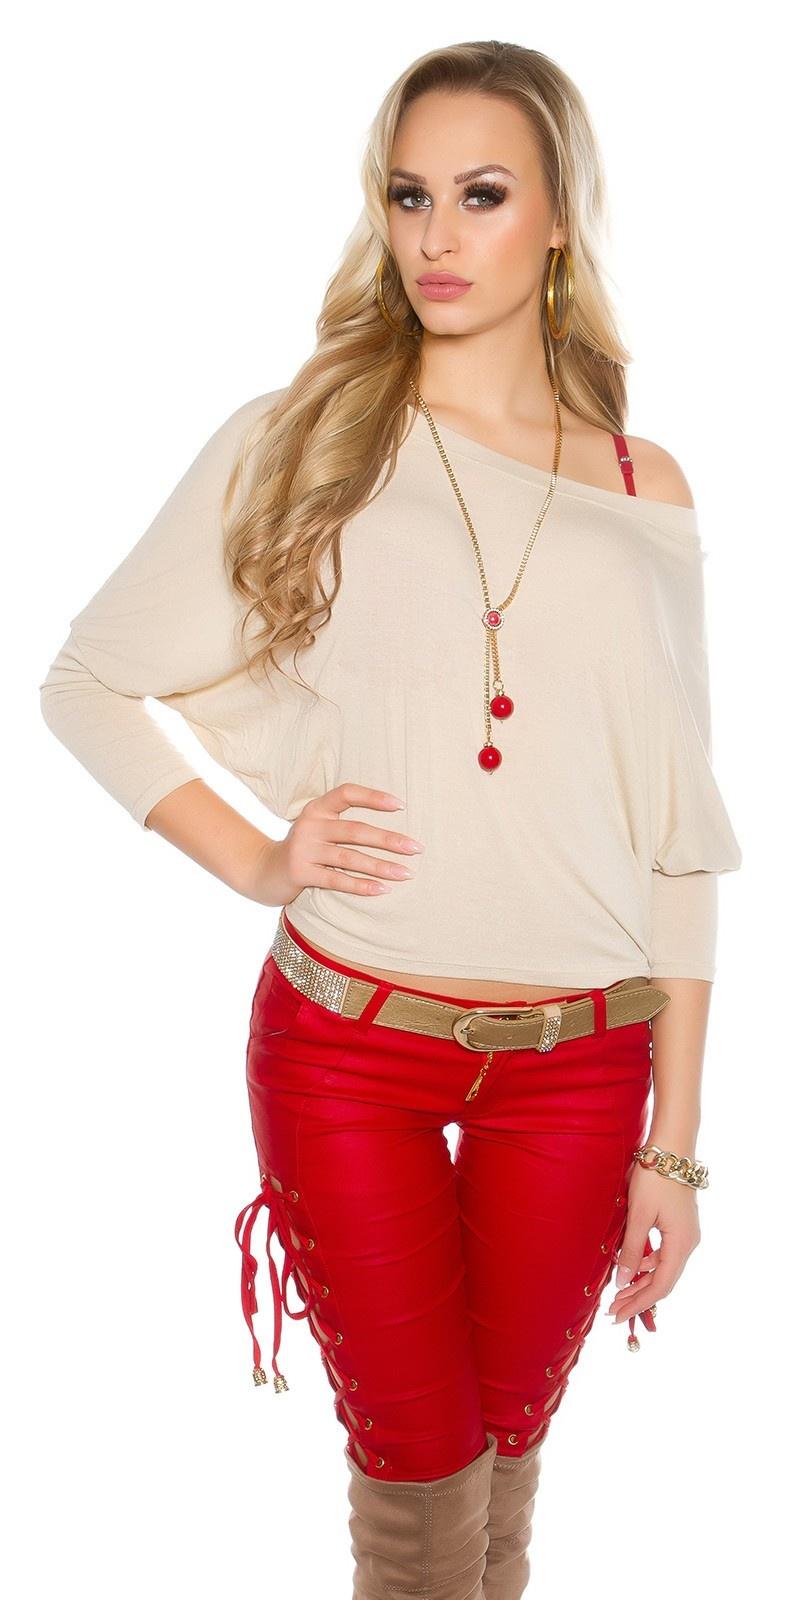 Trendy vleermuis-shirt met ketting beige